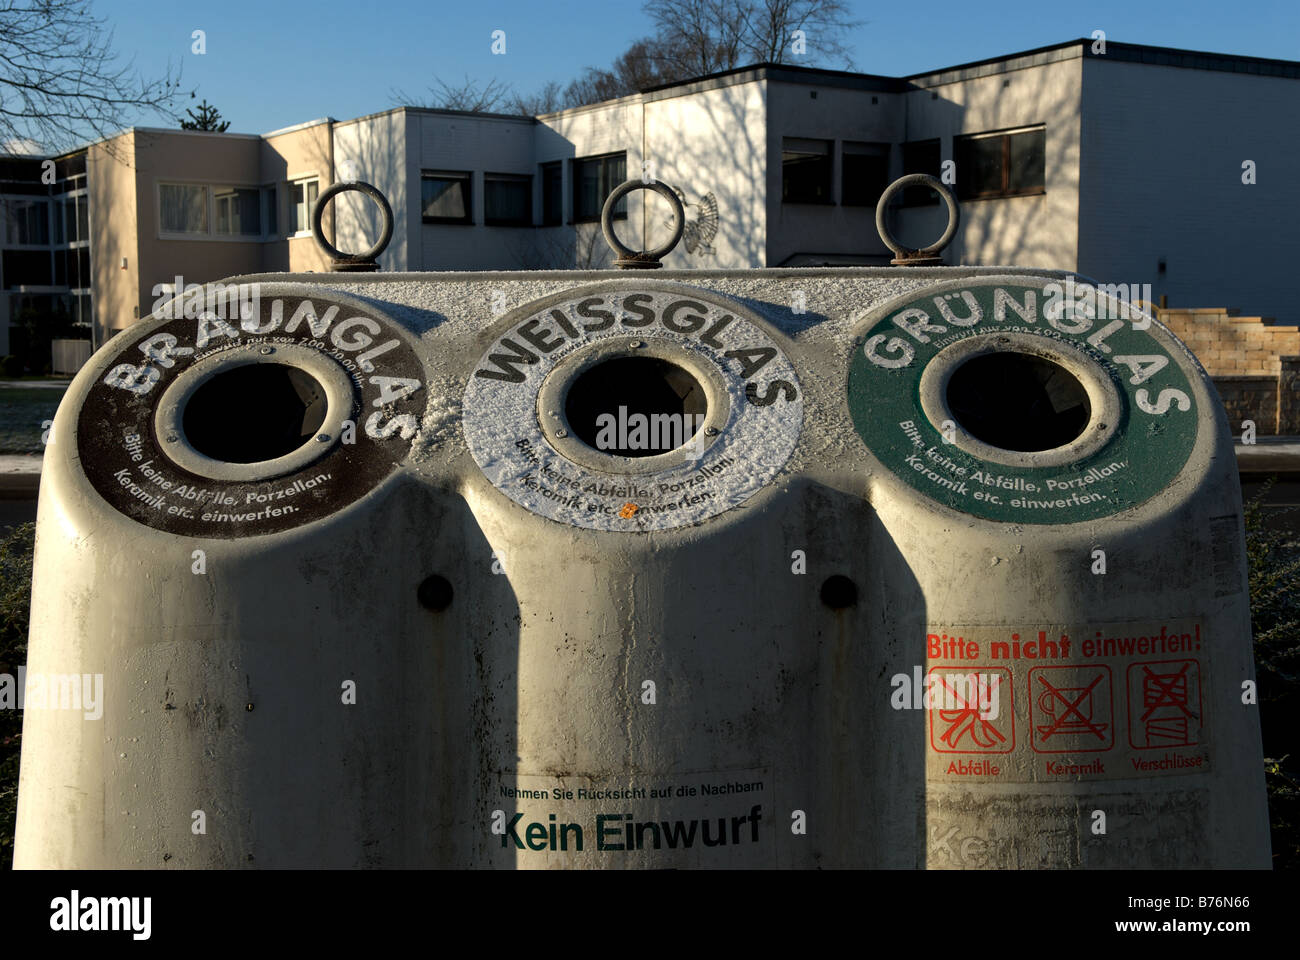 Street bottle bank, Leverkusen, North Rhine-Westphalia, Germany. - Stock Image